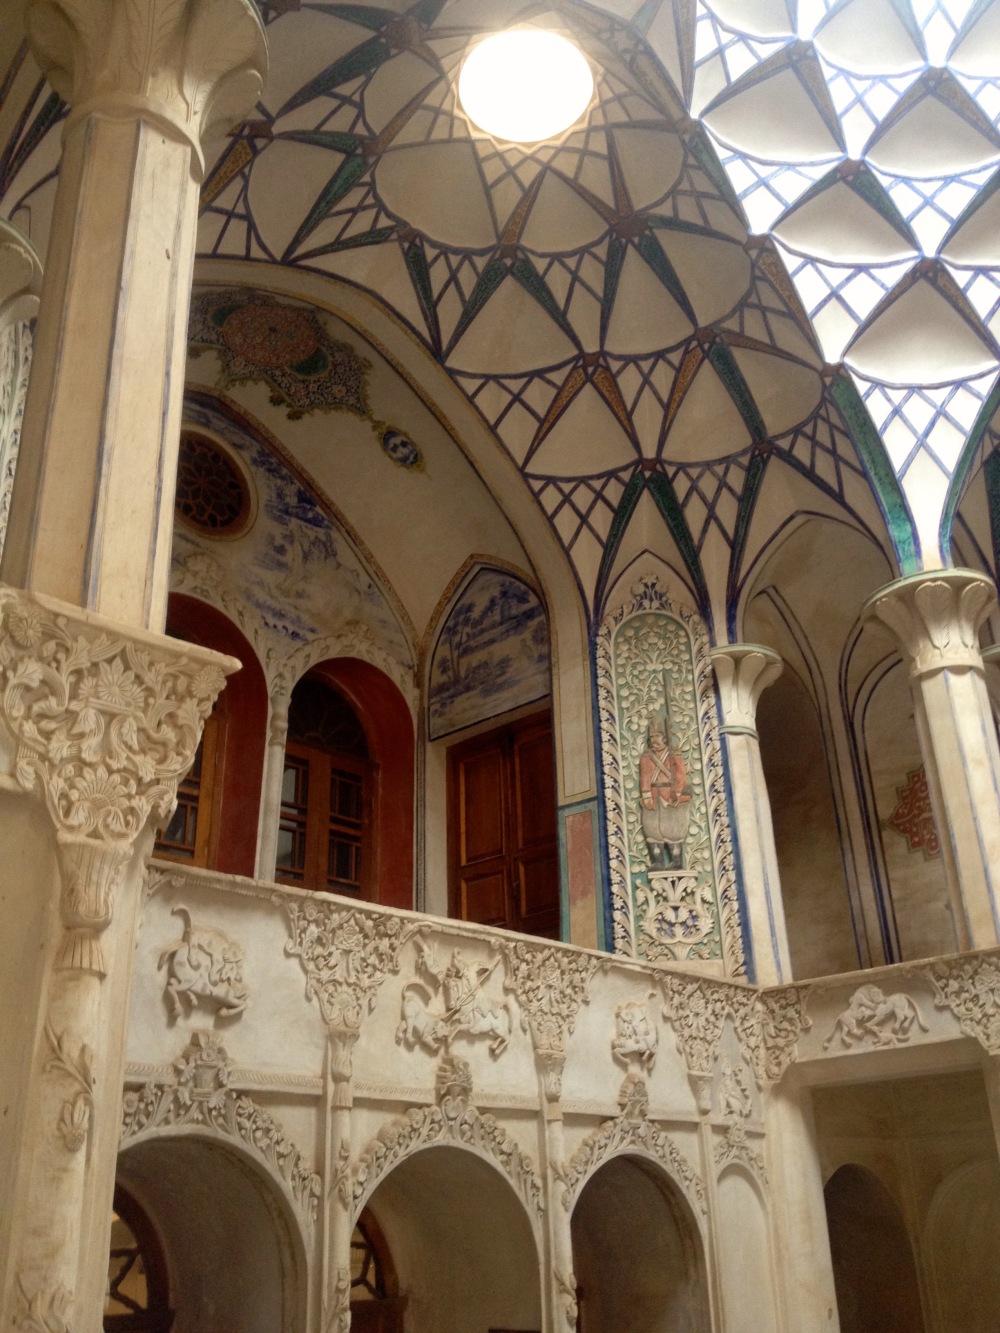 boroujerdi-house-interior-kashan-iran